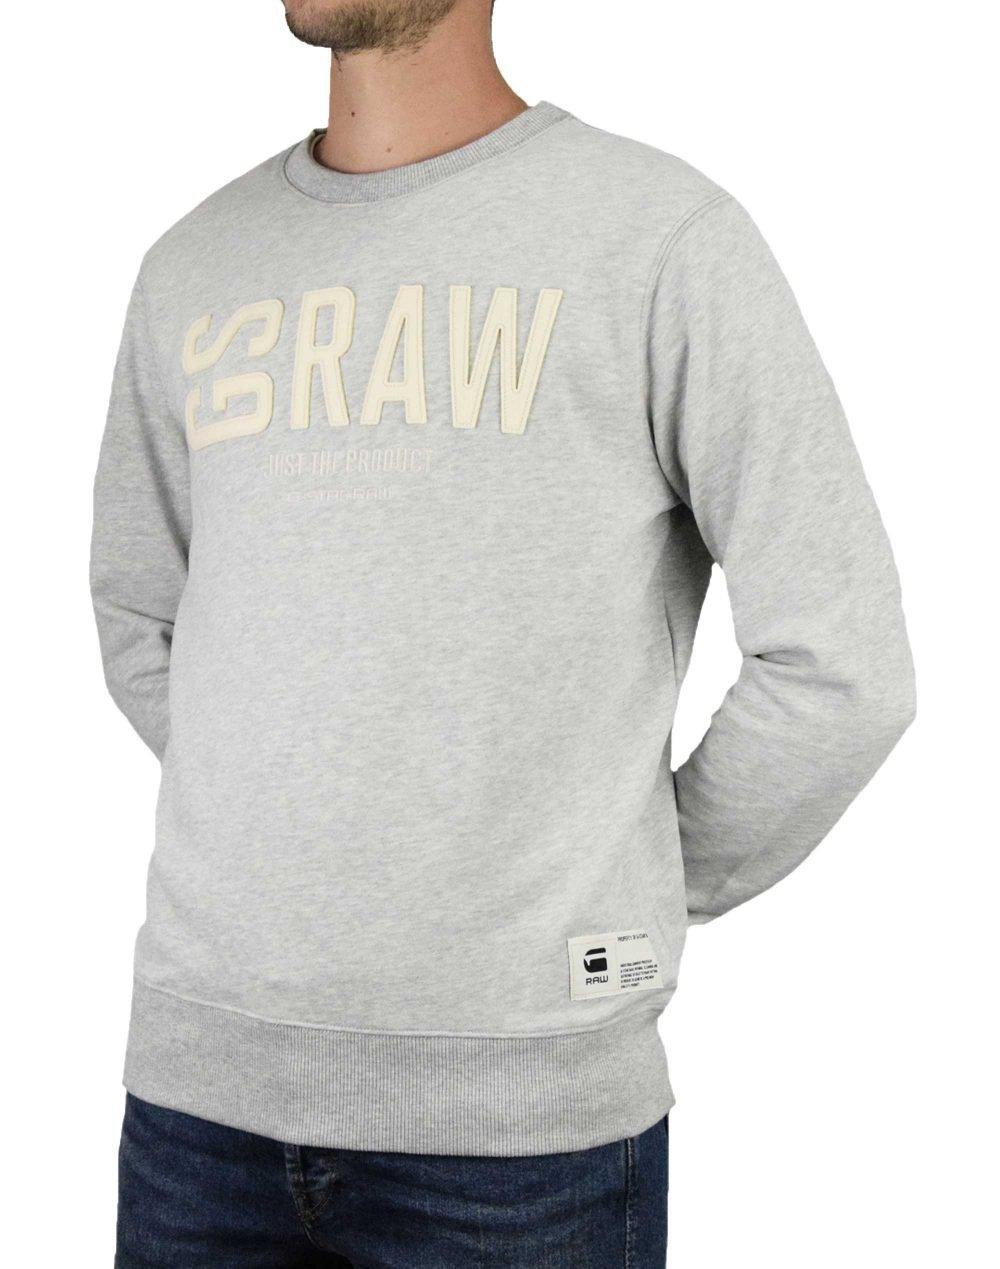 G-Star Raw Graphic 17 Core Crew Neck (D14725-B349-A302) Light Grey Heather